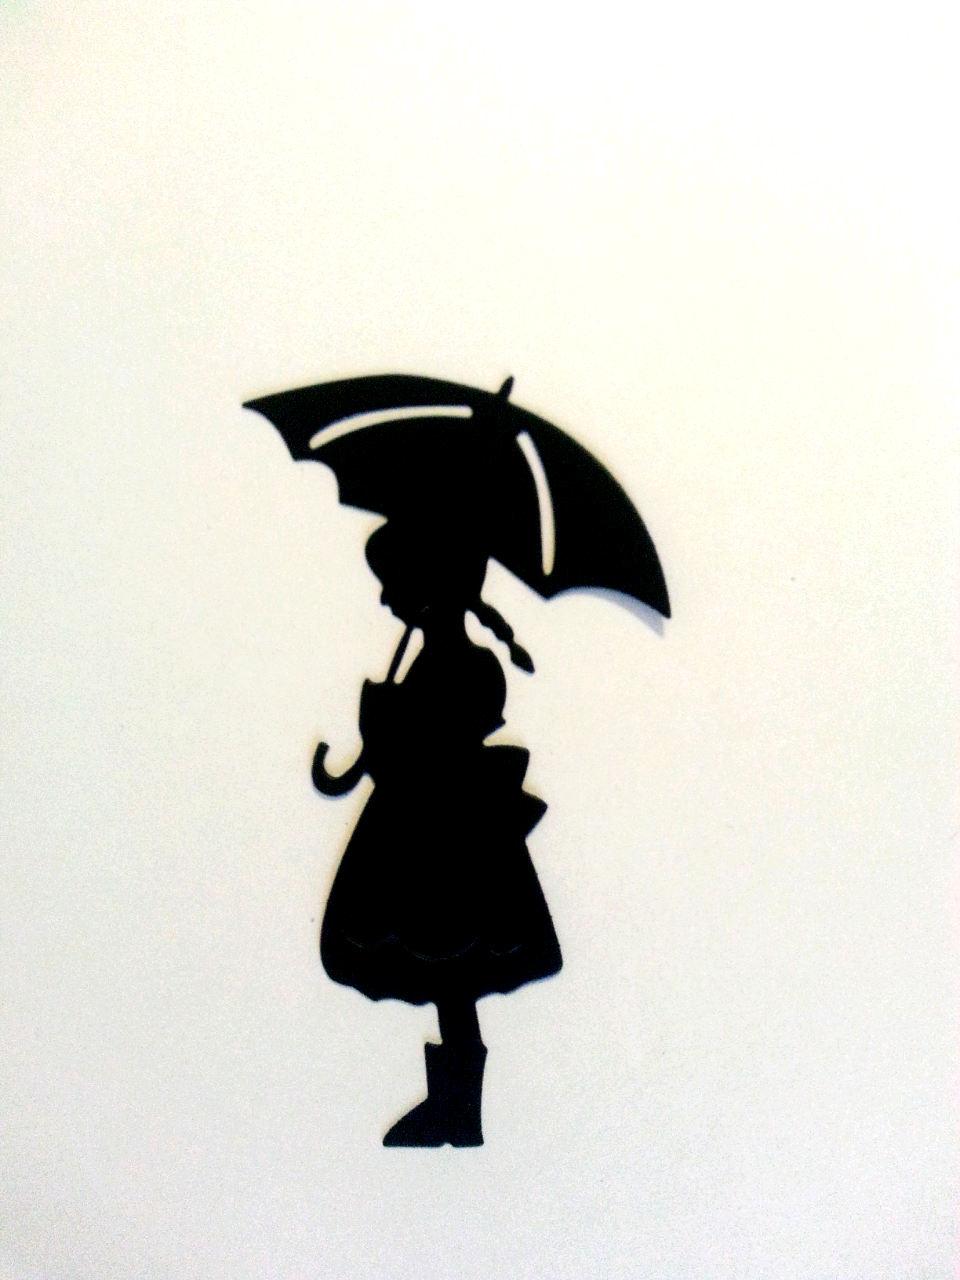 960x1280 Little Girl Under Umbrella Paper Die Cuts Scrapbook, Cupcakes